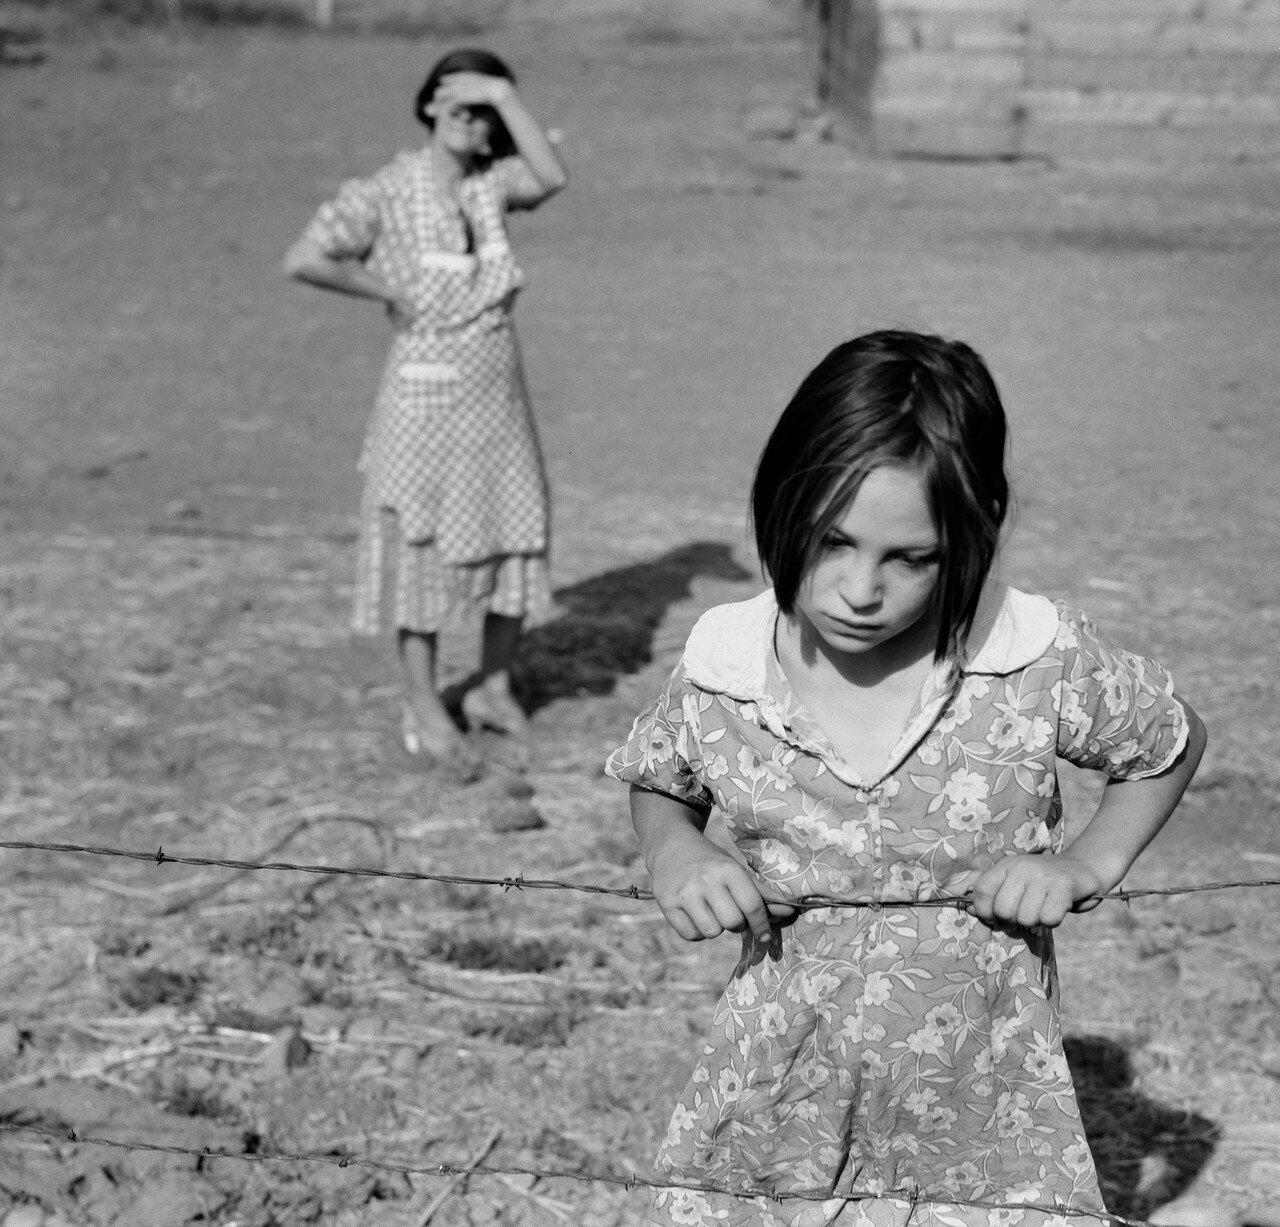 1939. Одна из младших дочерей батрака Криса Адольфа. Долина Якима